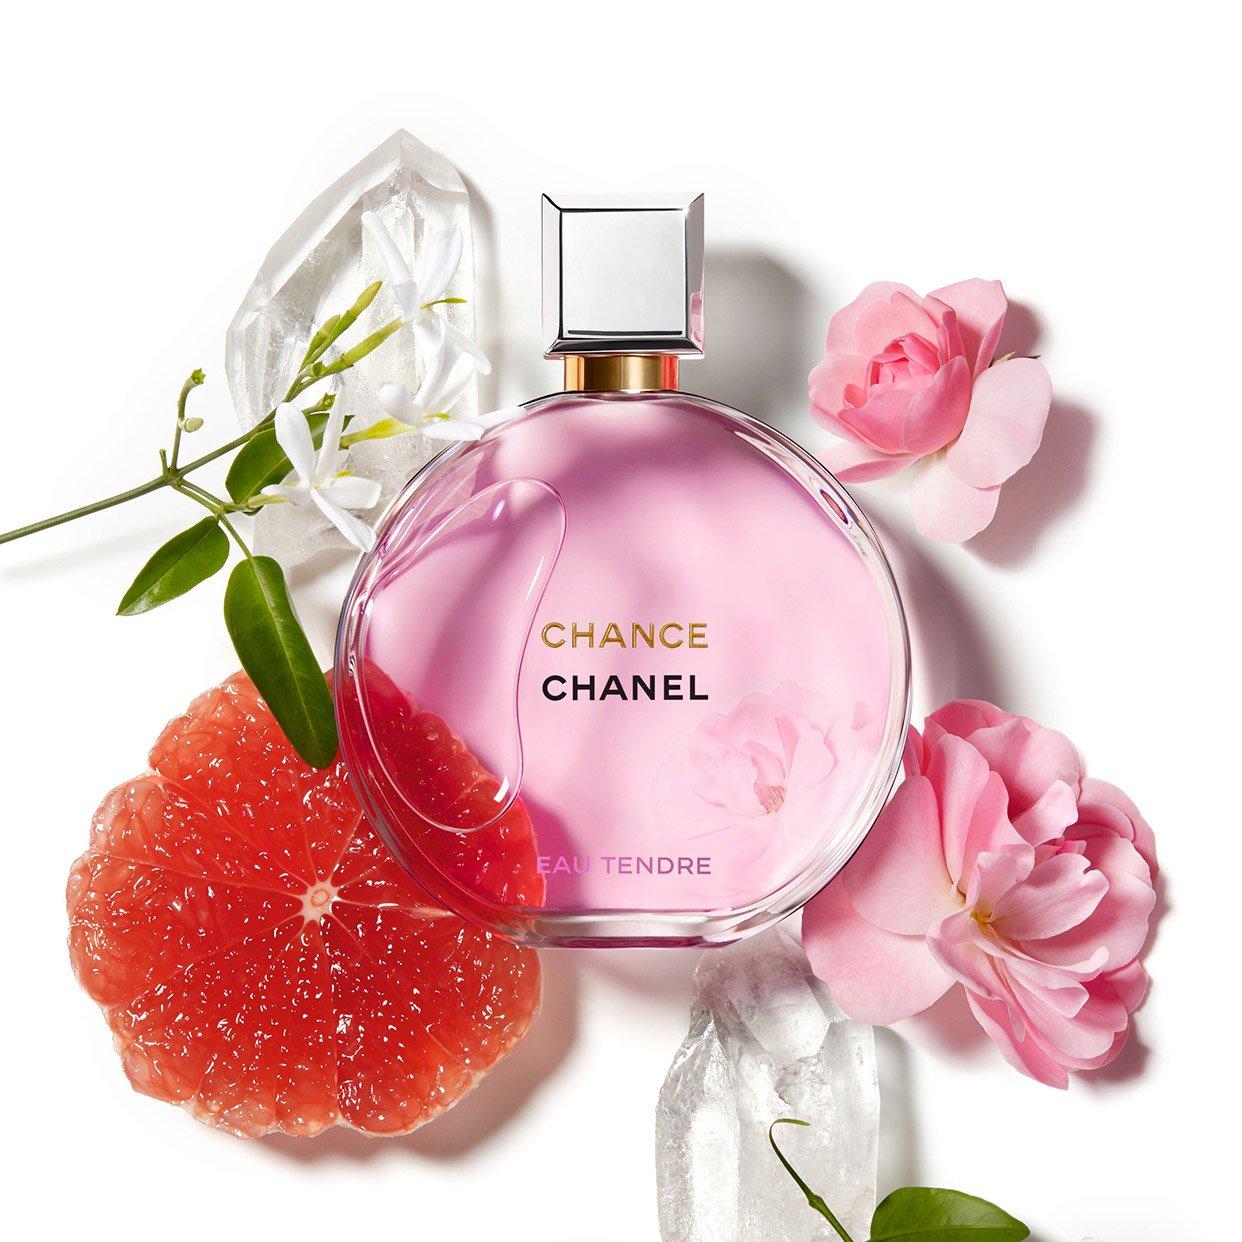 New Chance Eau Tendre Fragrance - Fragrance   CHANEL